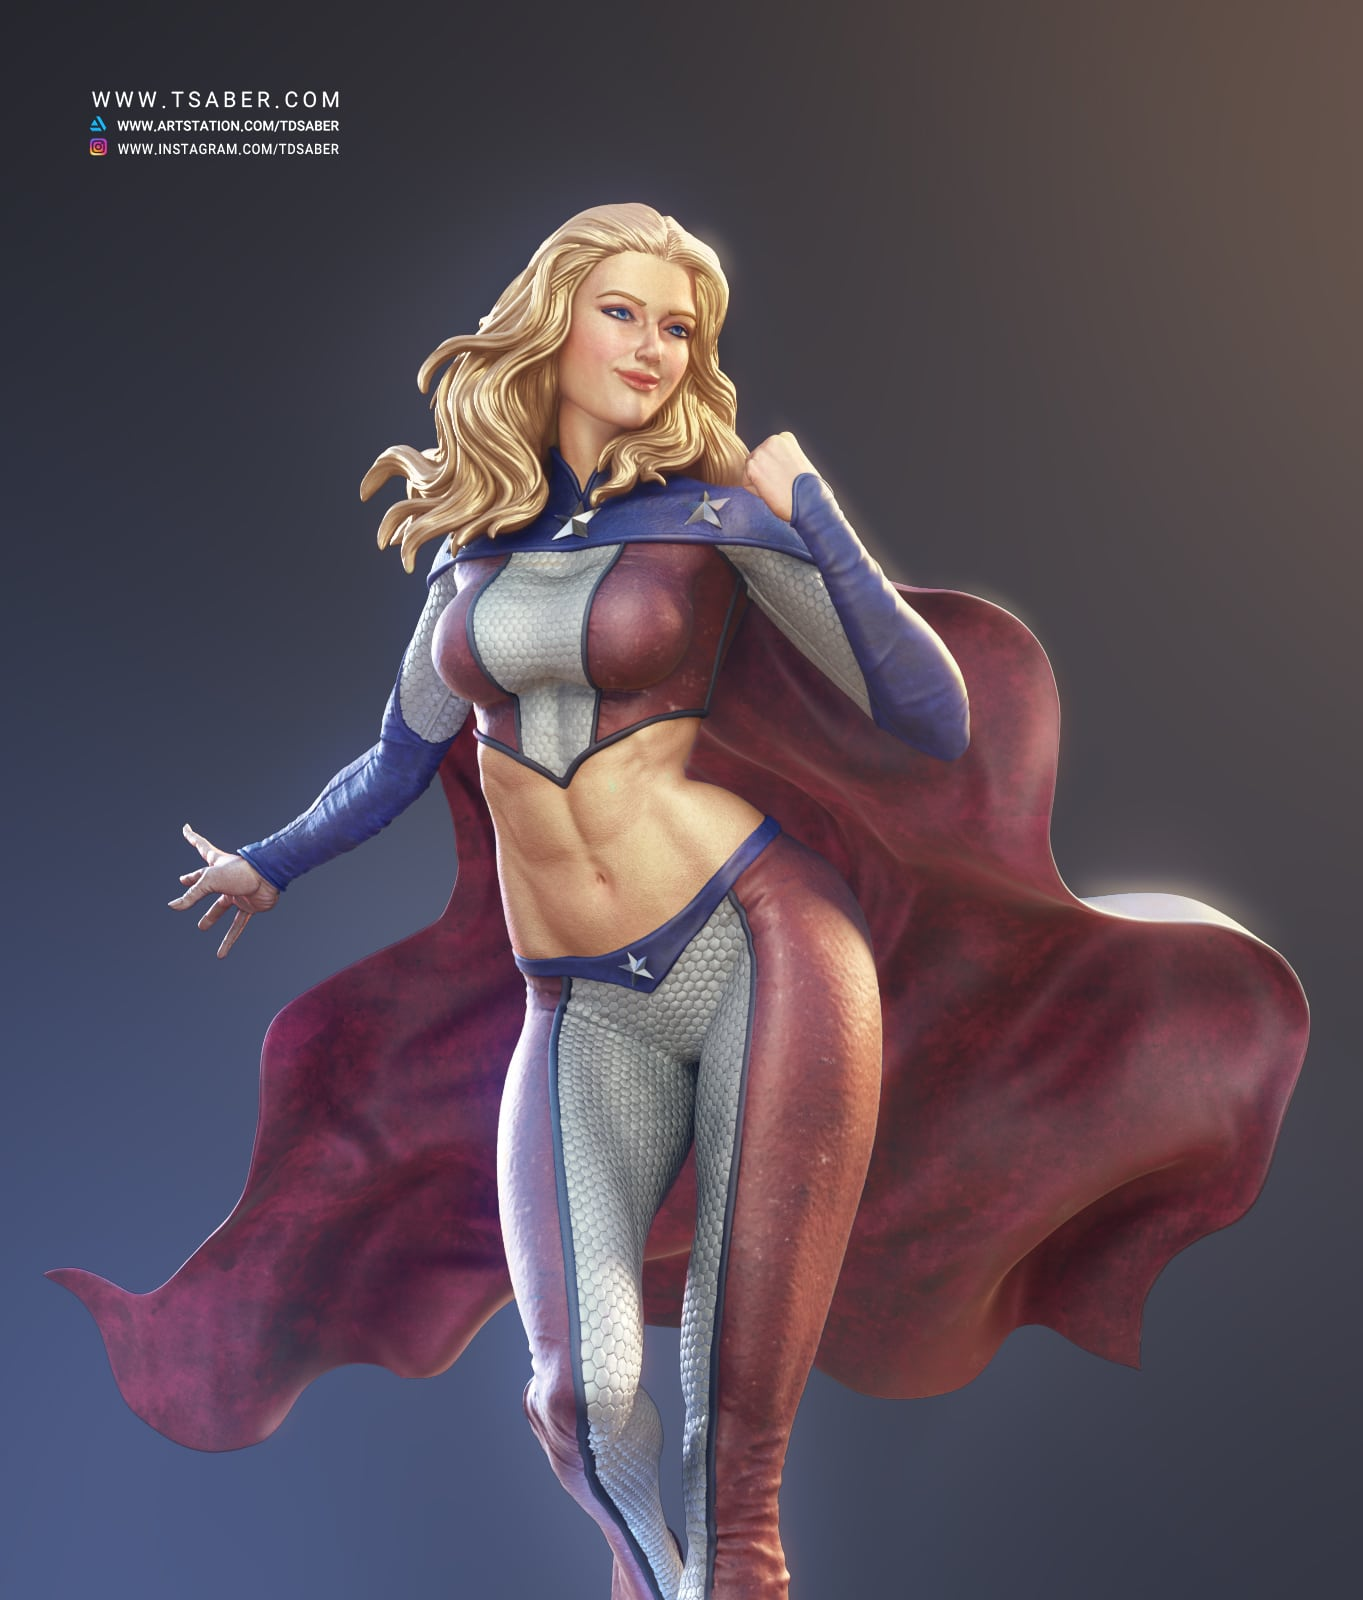 American Star Zbrush Statue - Superhero character- Tsaber